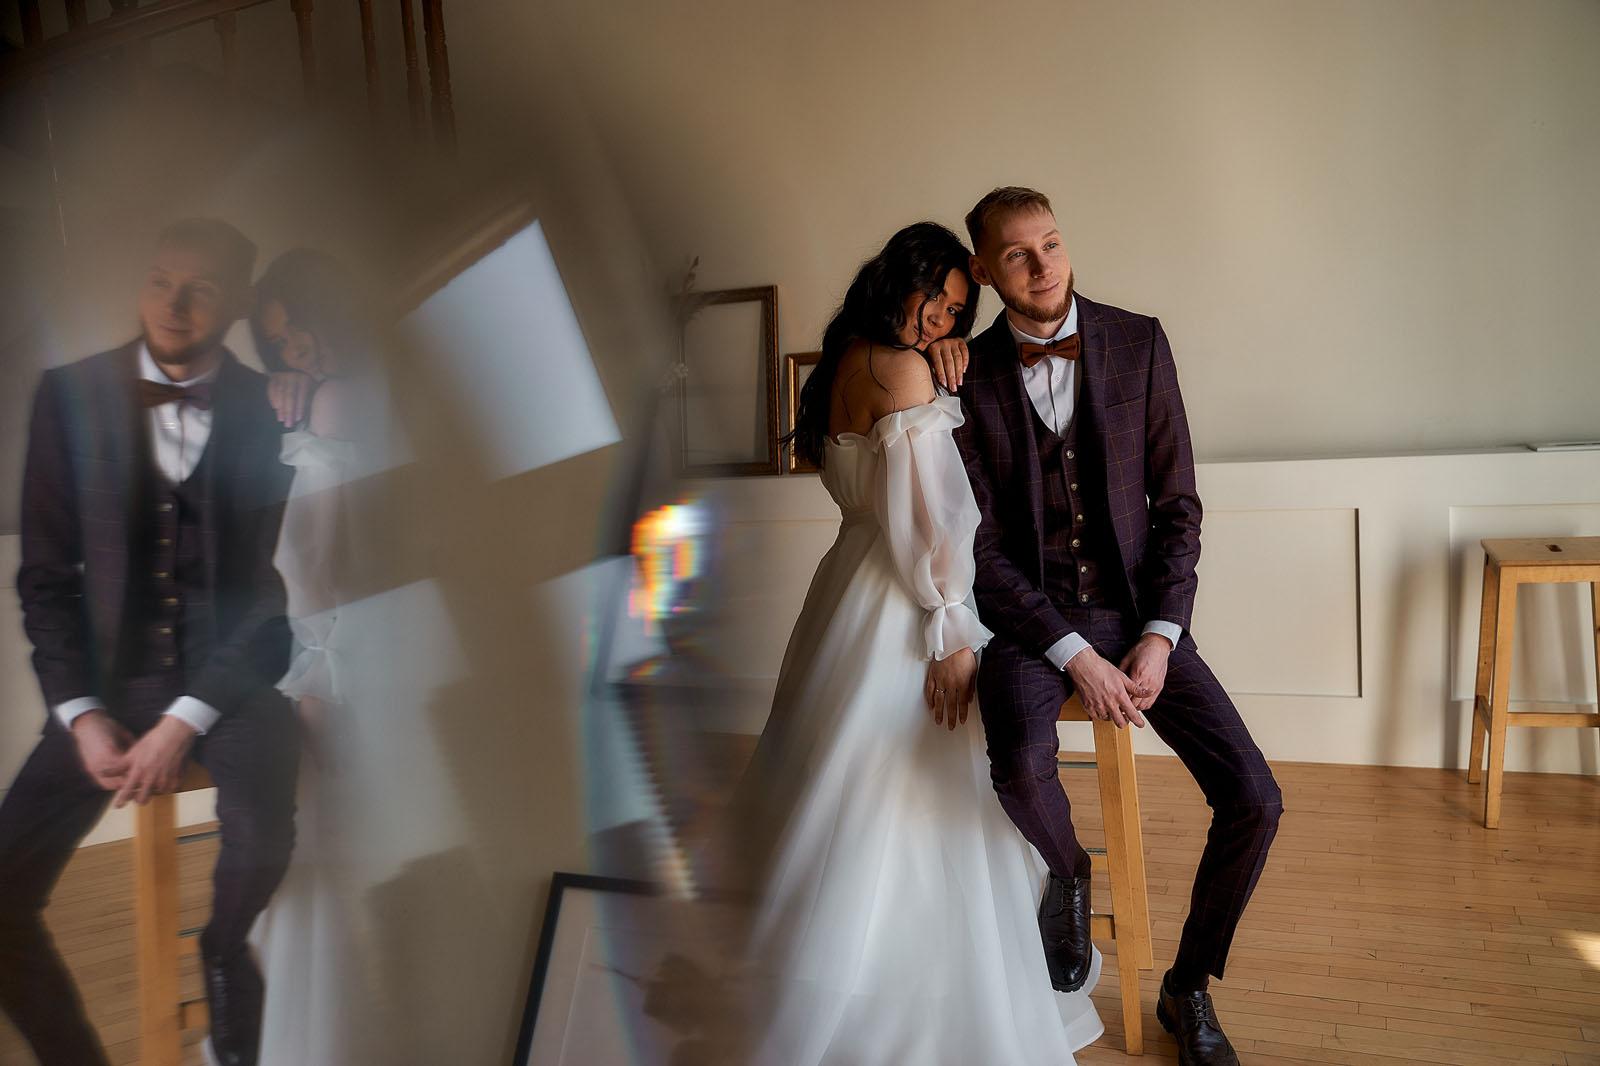 wedding@bekarev2021-04-10-11-31-04.jpg